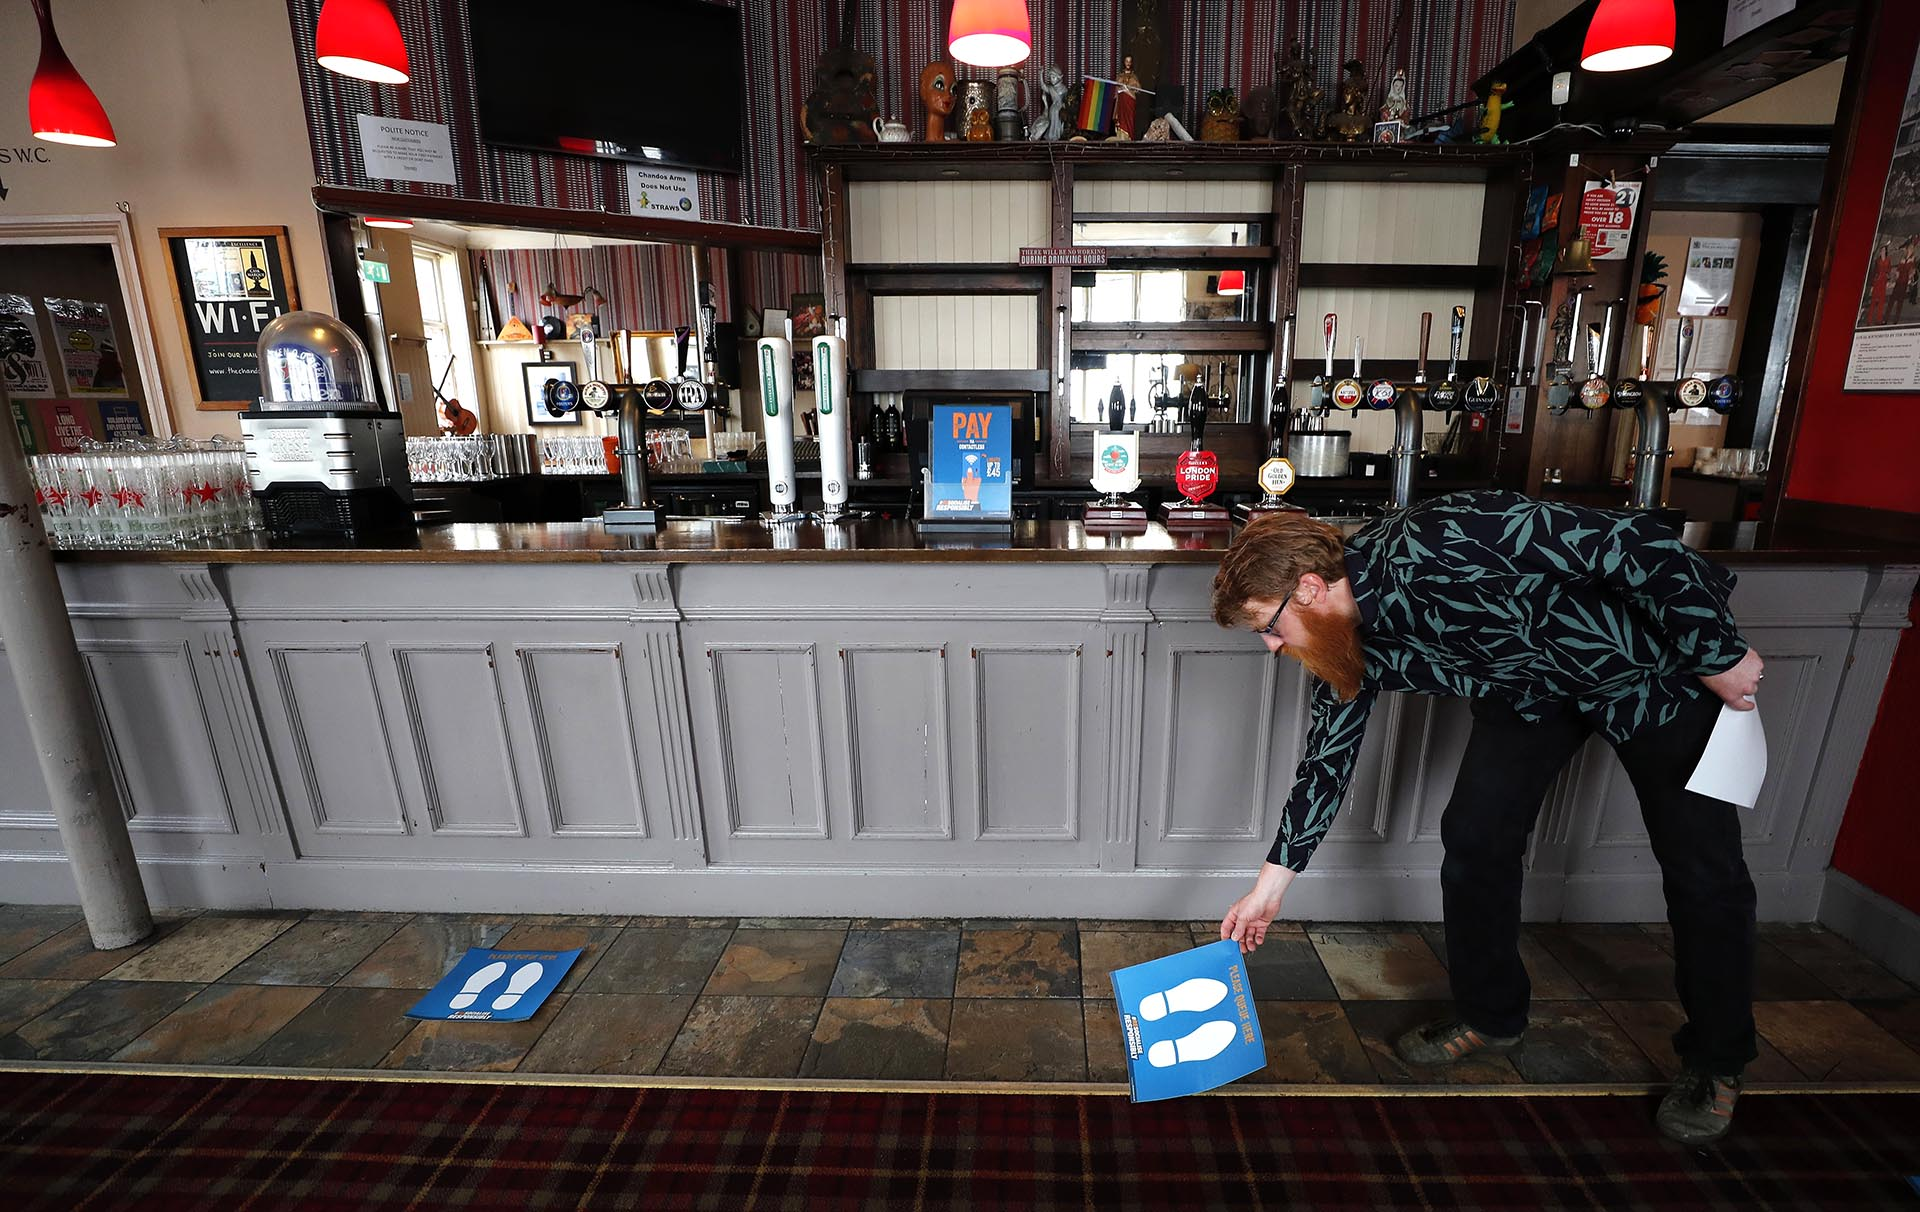 Un hombre acondiciona un pub para la reapertura (AP Photo/Frank Augstein)